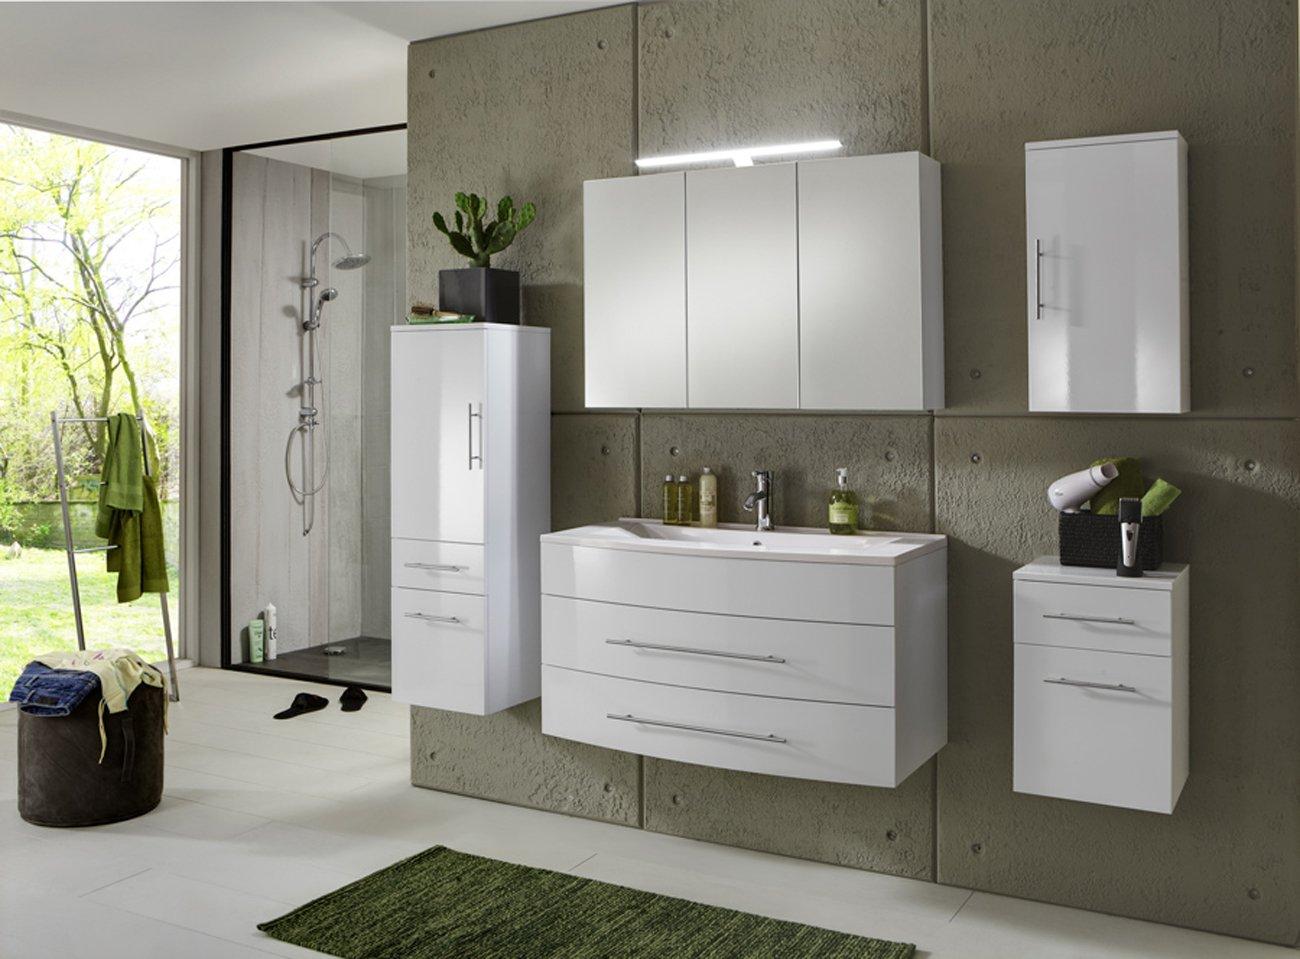 SAM® Badmöbel-Set Basel 5 teilig, hochglanz weiß, 100 cm ...